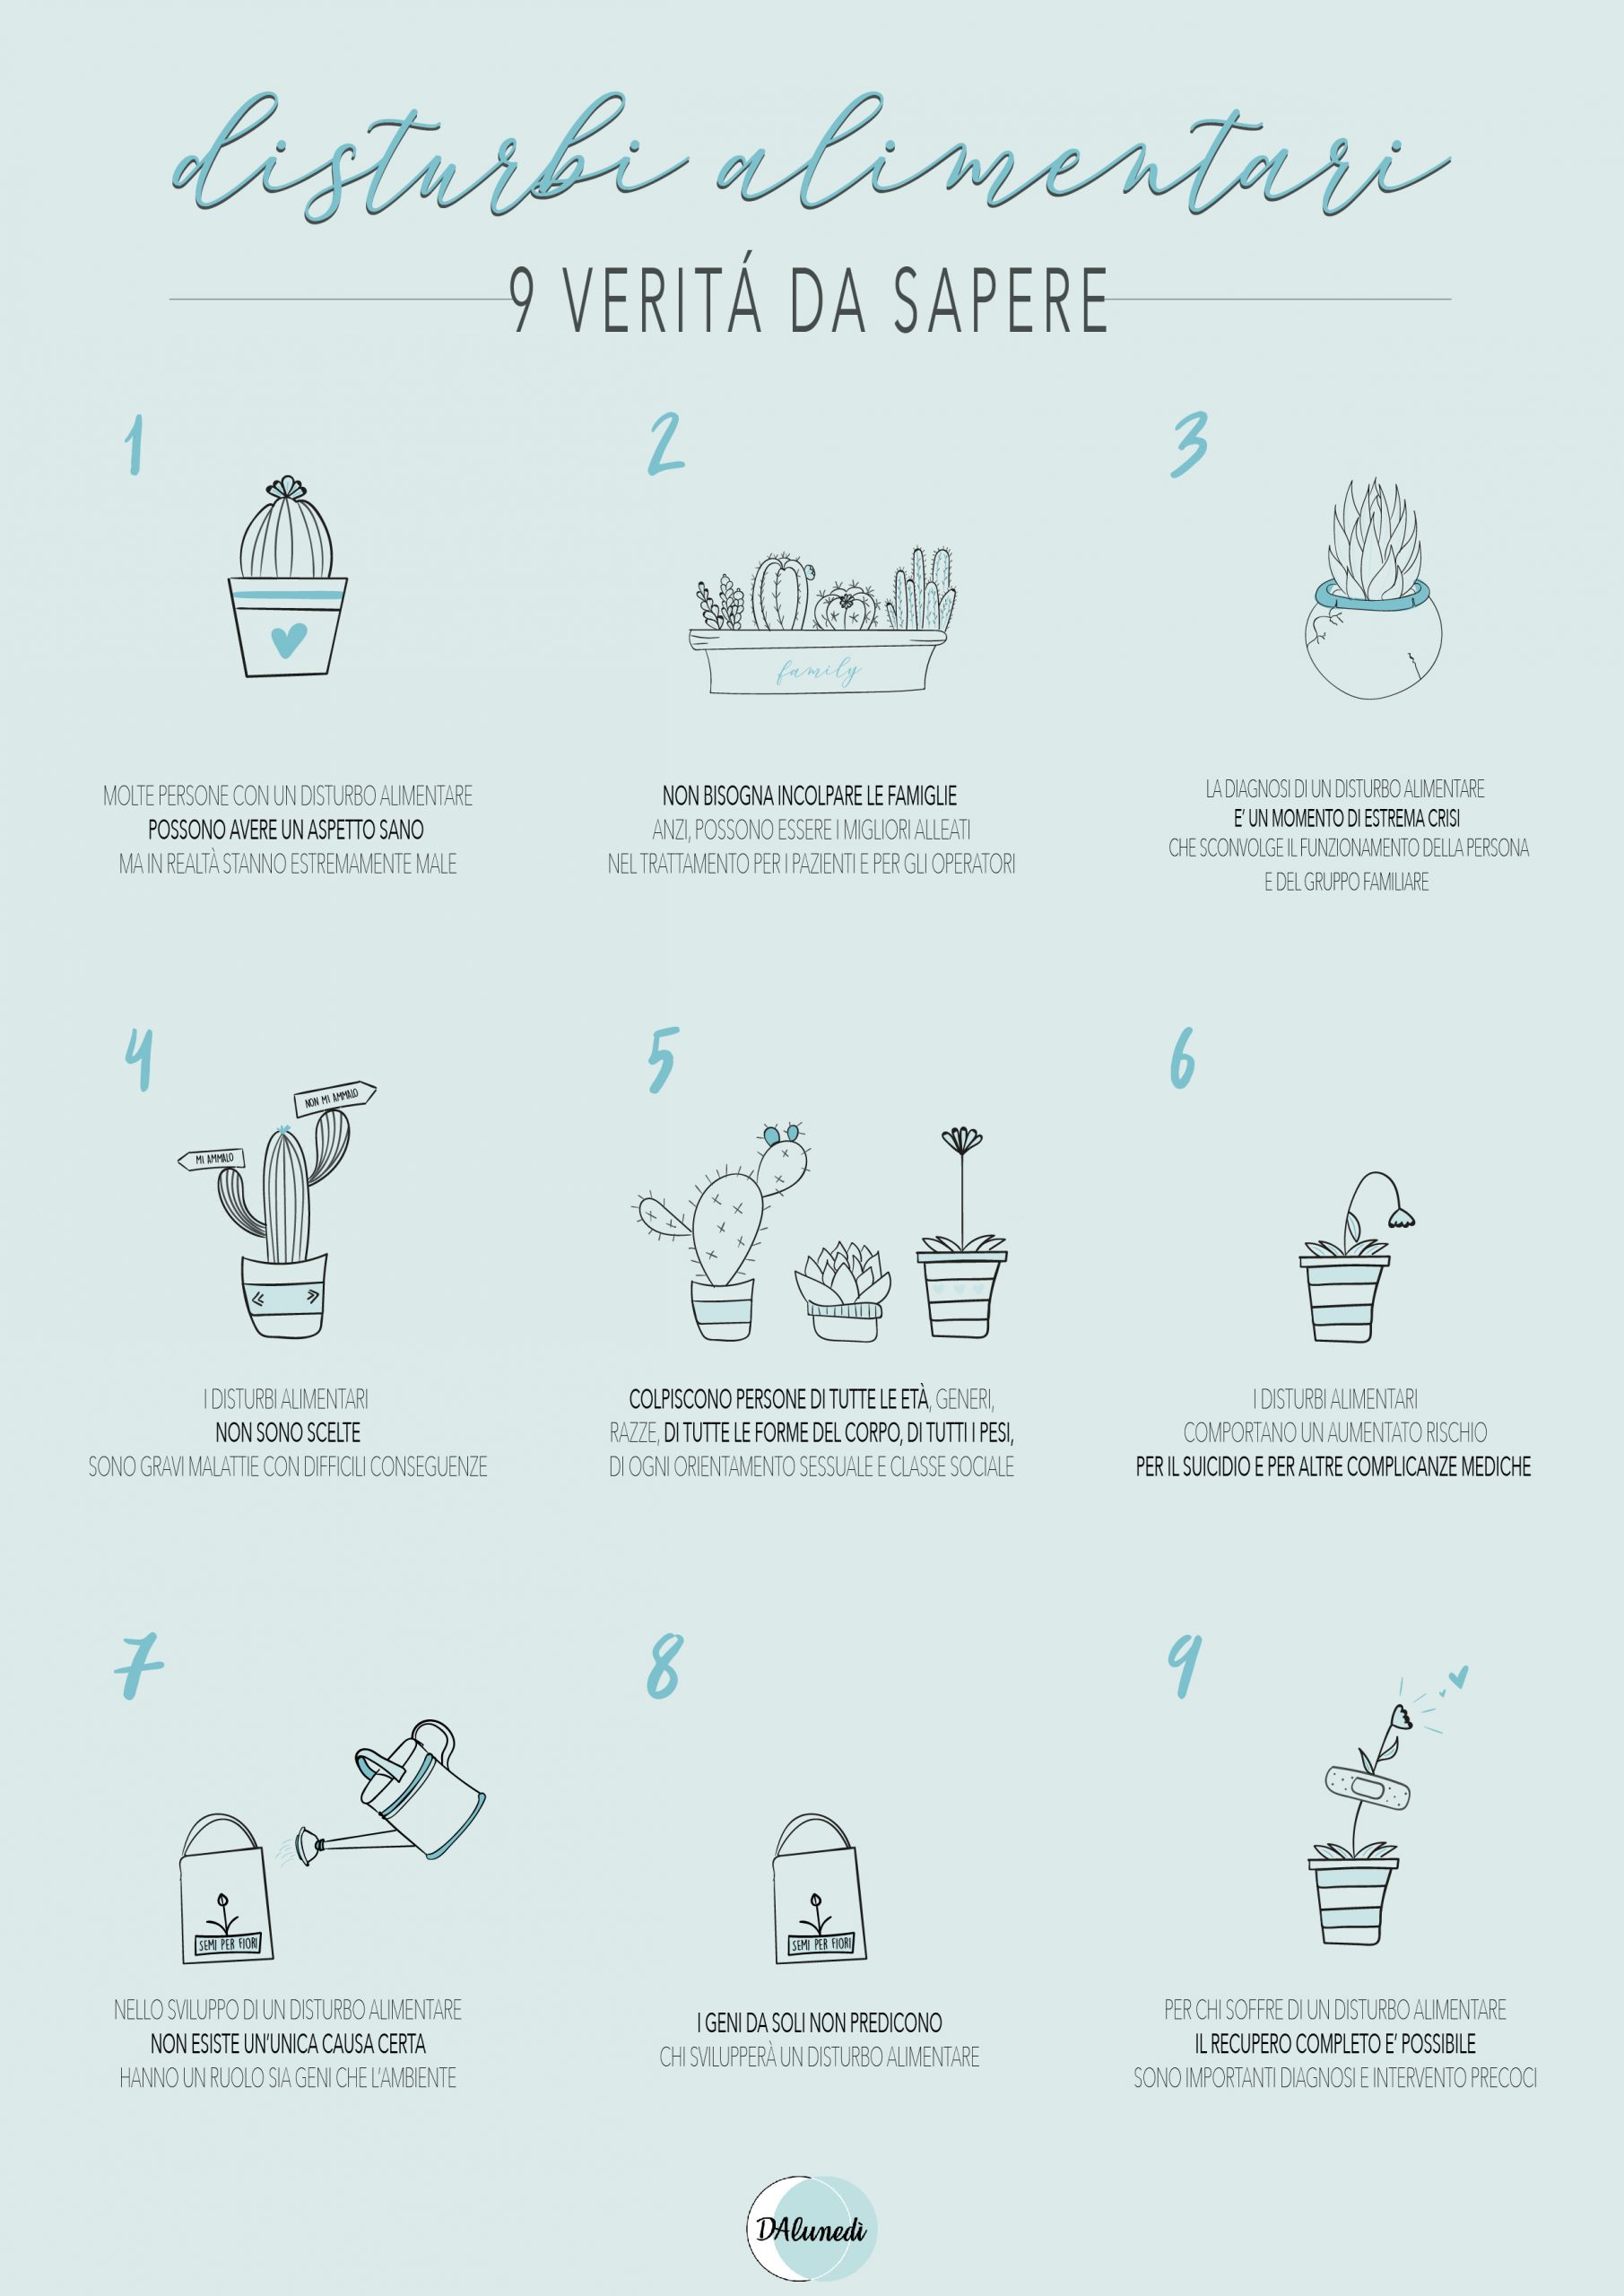 Manifesto Disturbi alimentari 9 verità da sapere